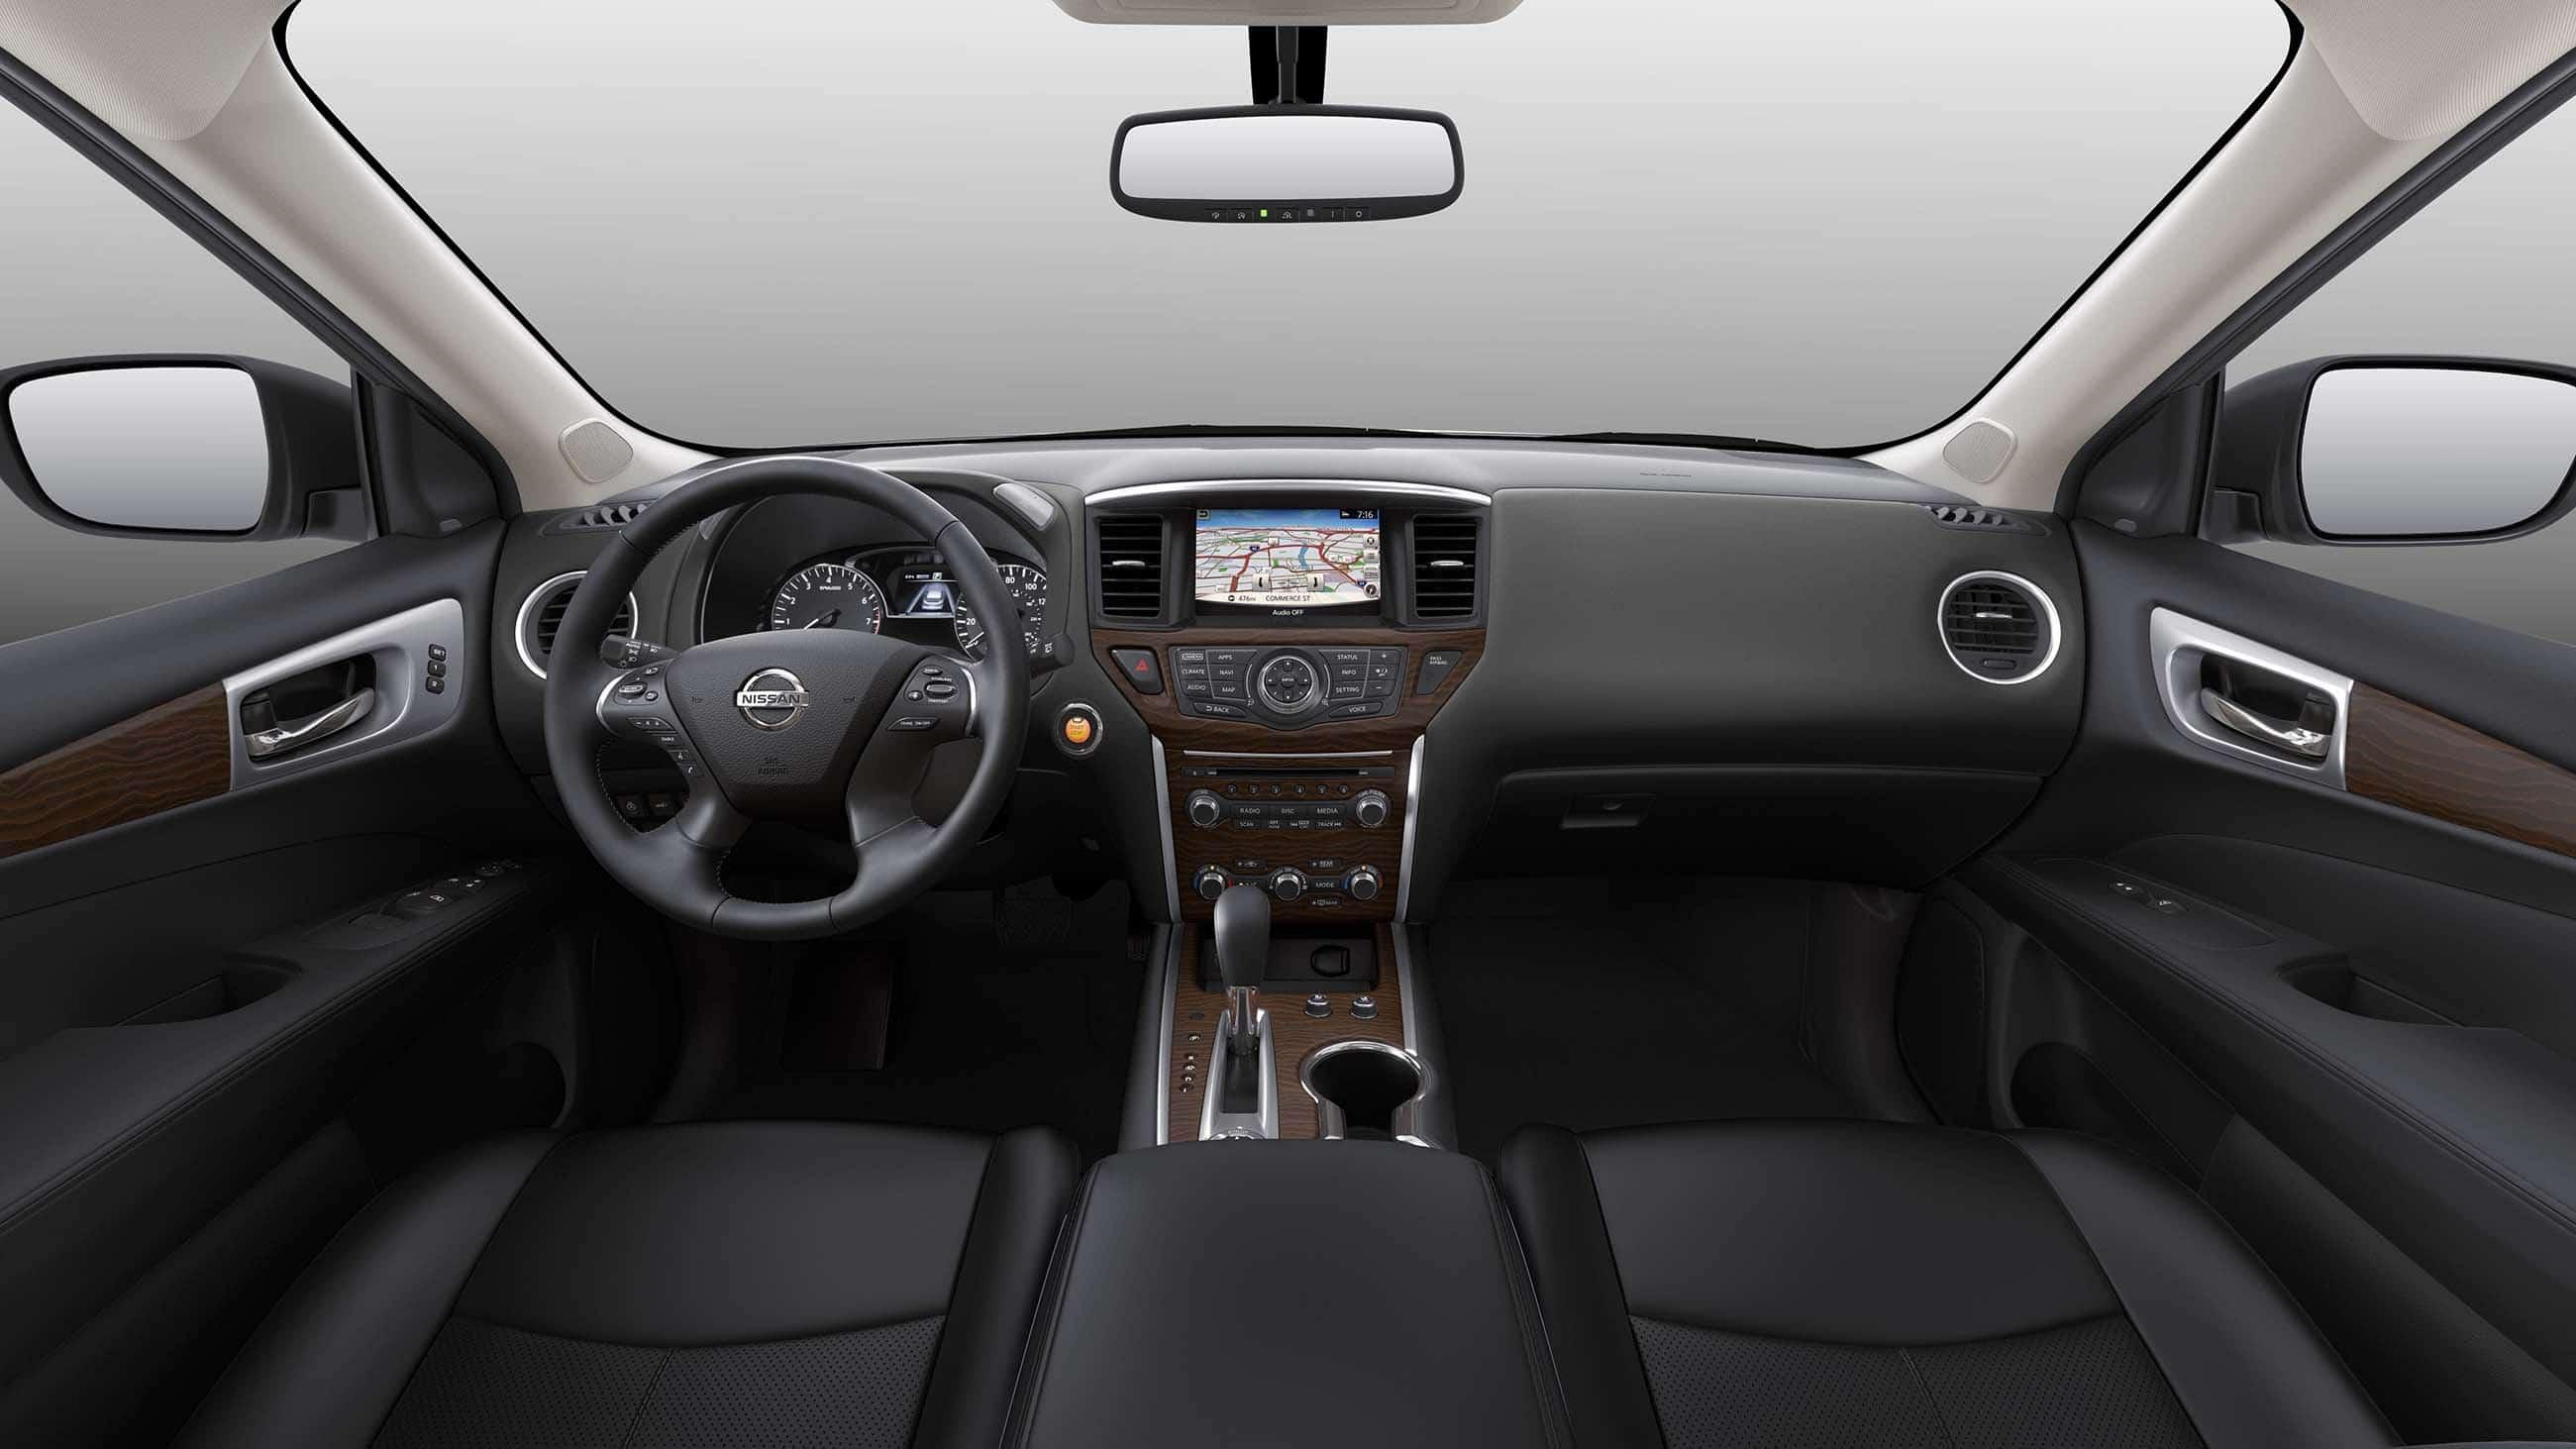 First Look: 2017 Nissan Pathfinder | TheDetroitBureau.com